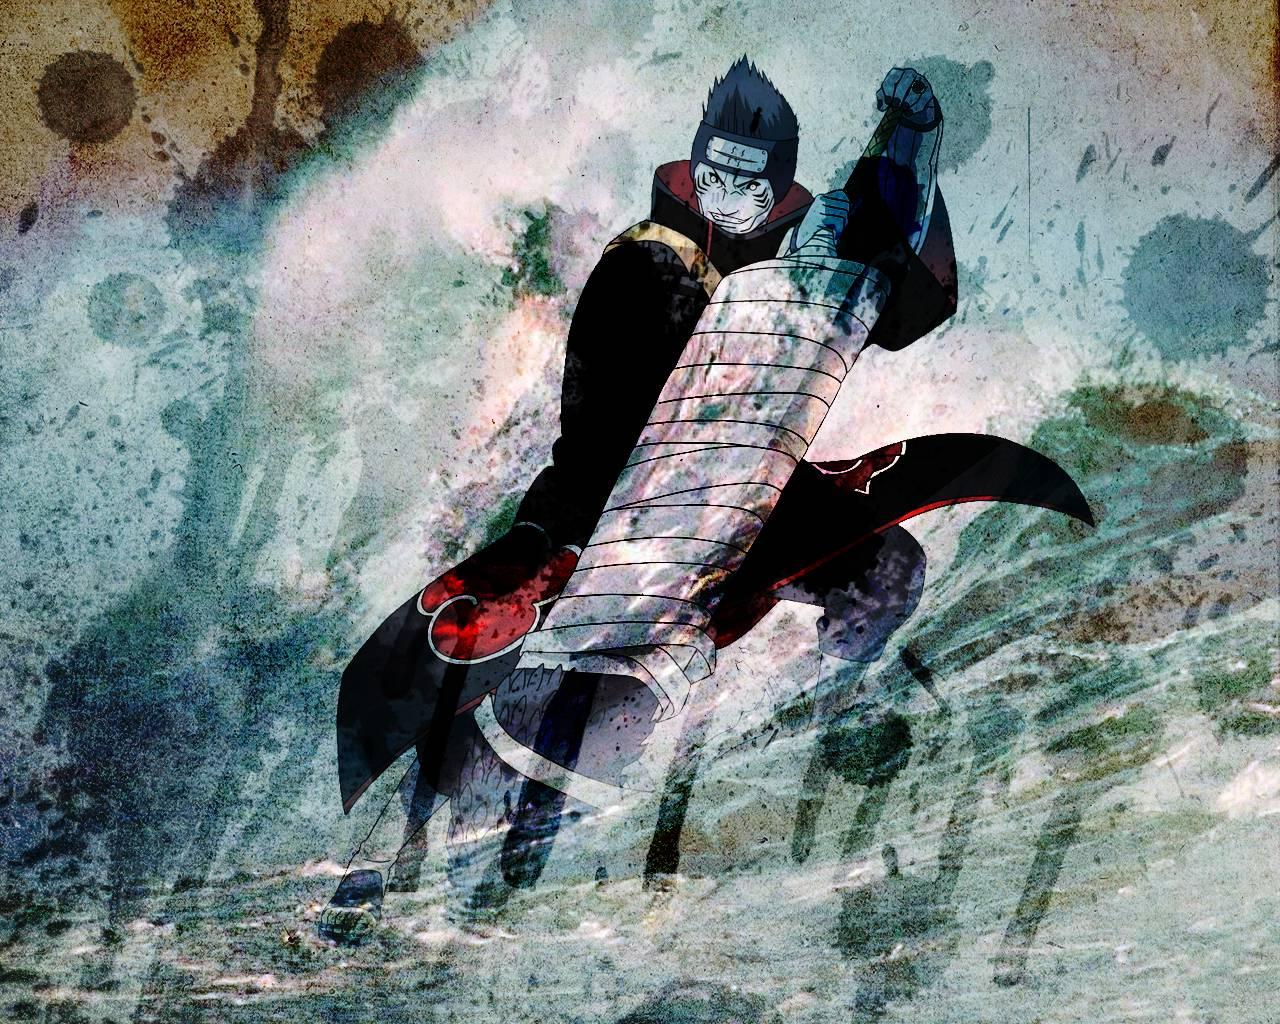 Wallpaper Hd Naruto Shippuden 3d Kisame Wallpapers Wallpaper Cave